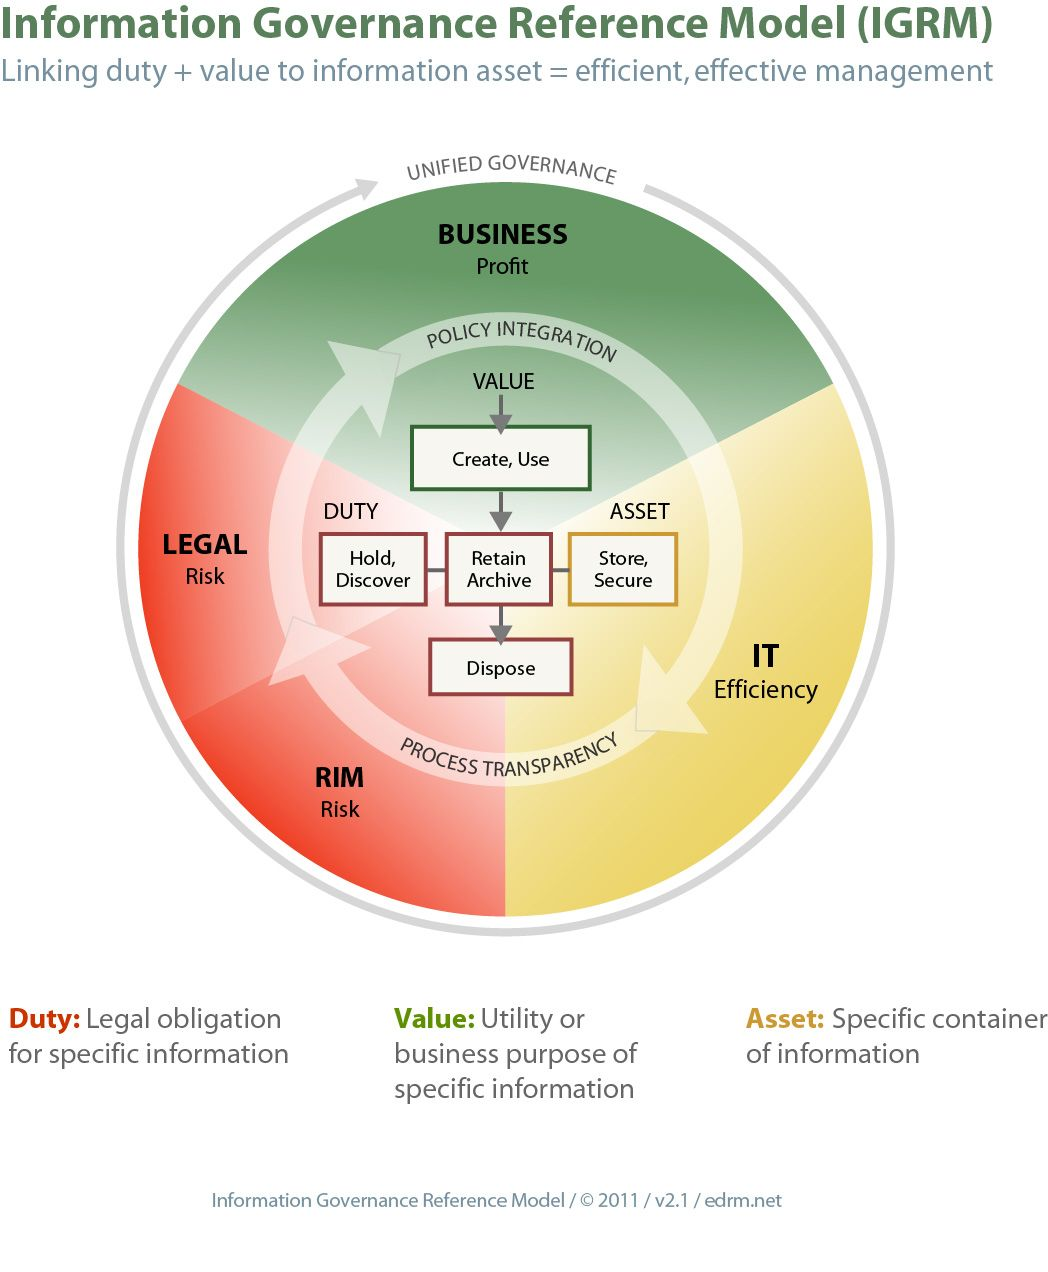 Cloud computing security concerns: How to audit cloud computing